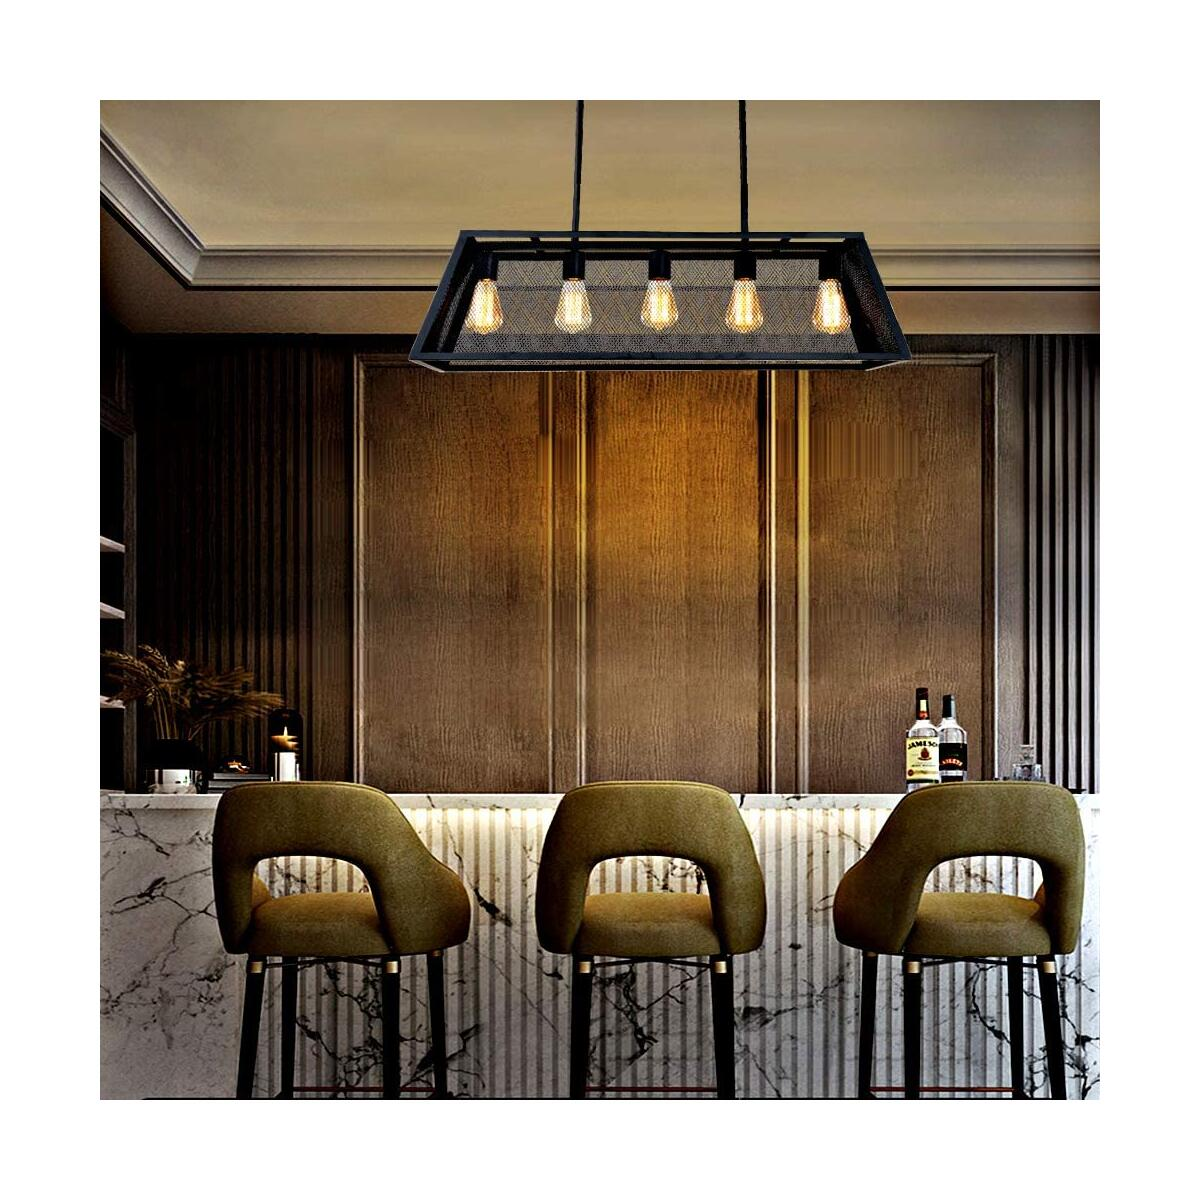 Farmhouse Kitchen Island Lighting Industrial Dining Room Light, 31.5'' Matte Black 5-Light Linear Chandeliers Mesh Net Ceiling Hanging Light Metal Finish, Pool Table Pendant Light Fixture